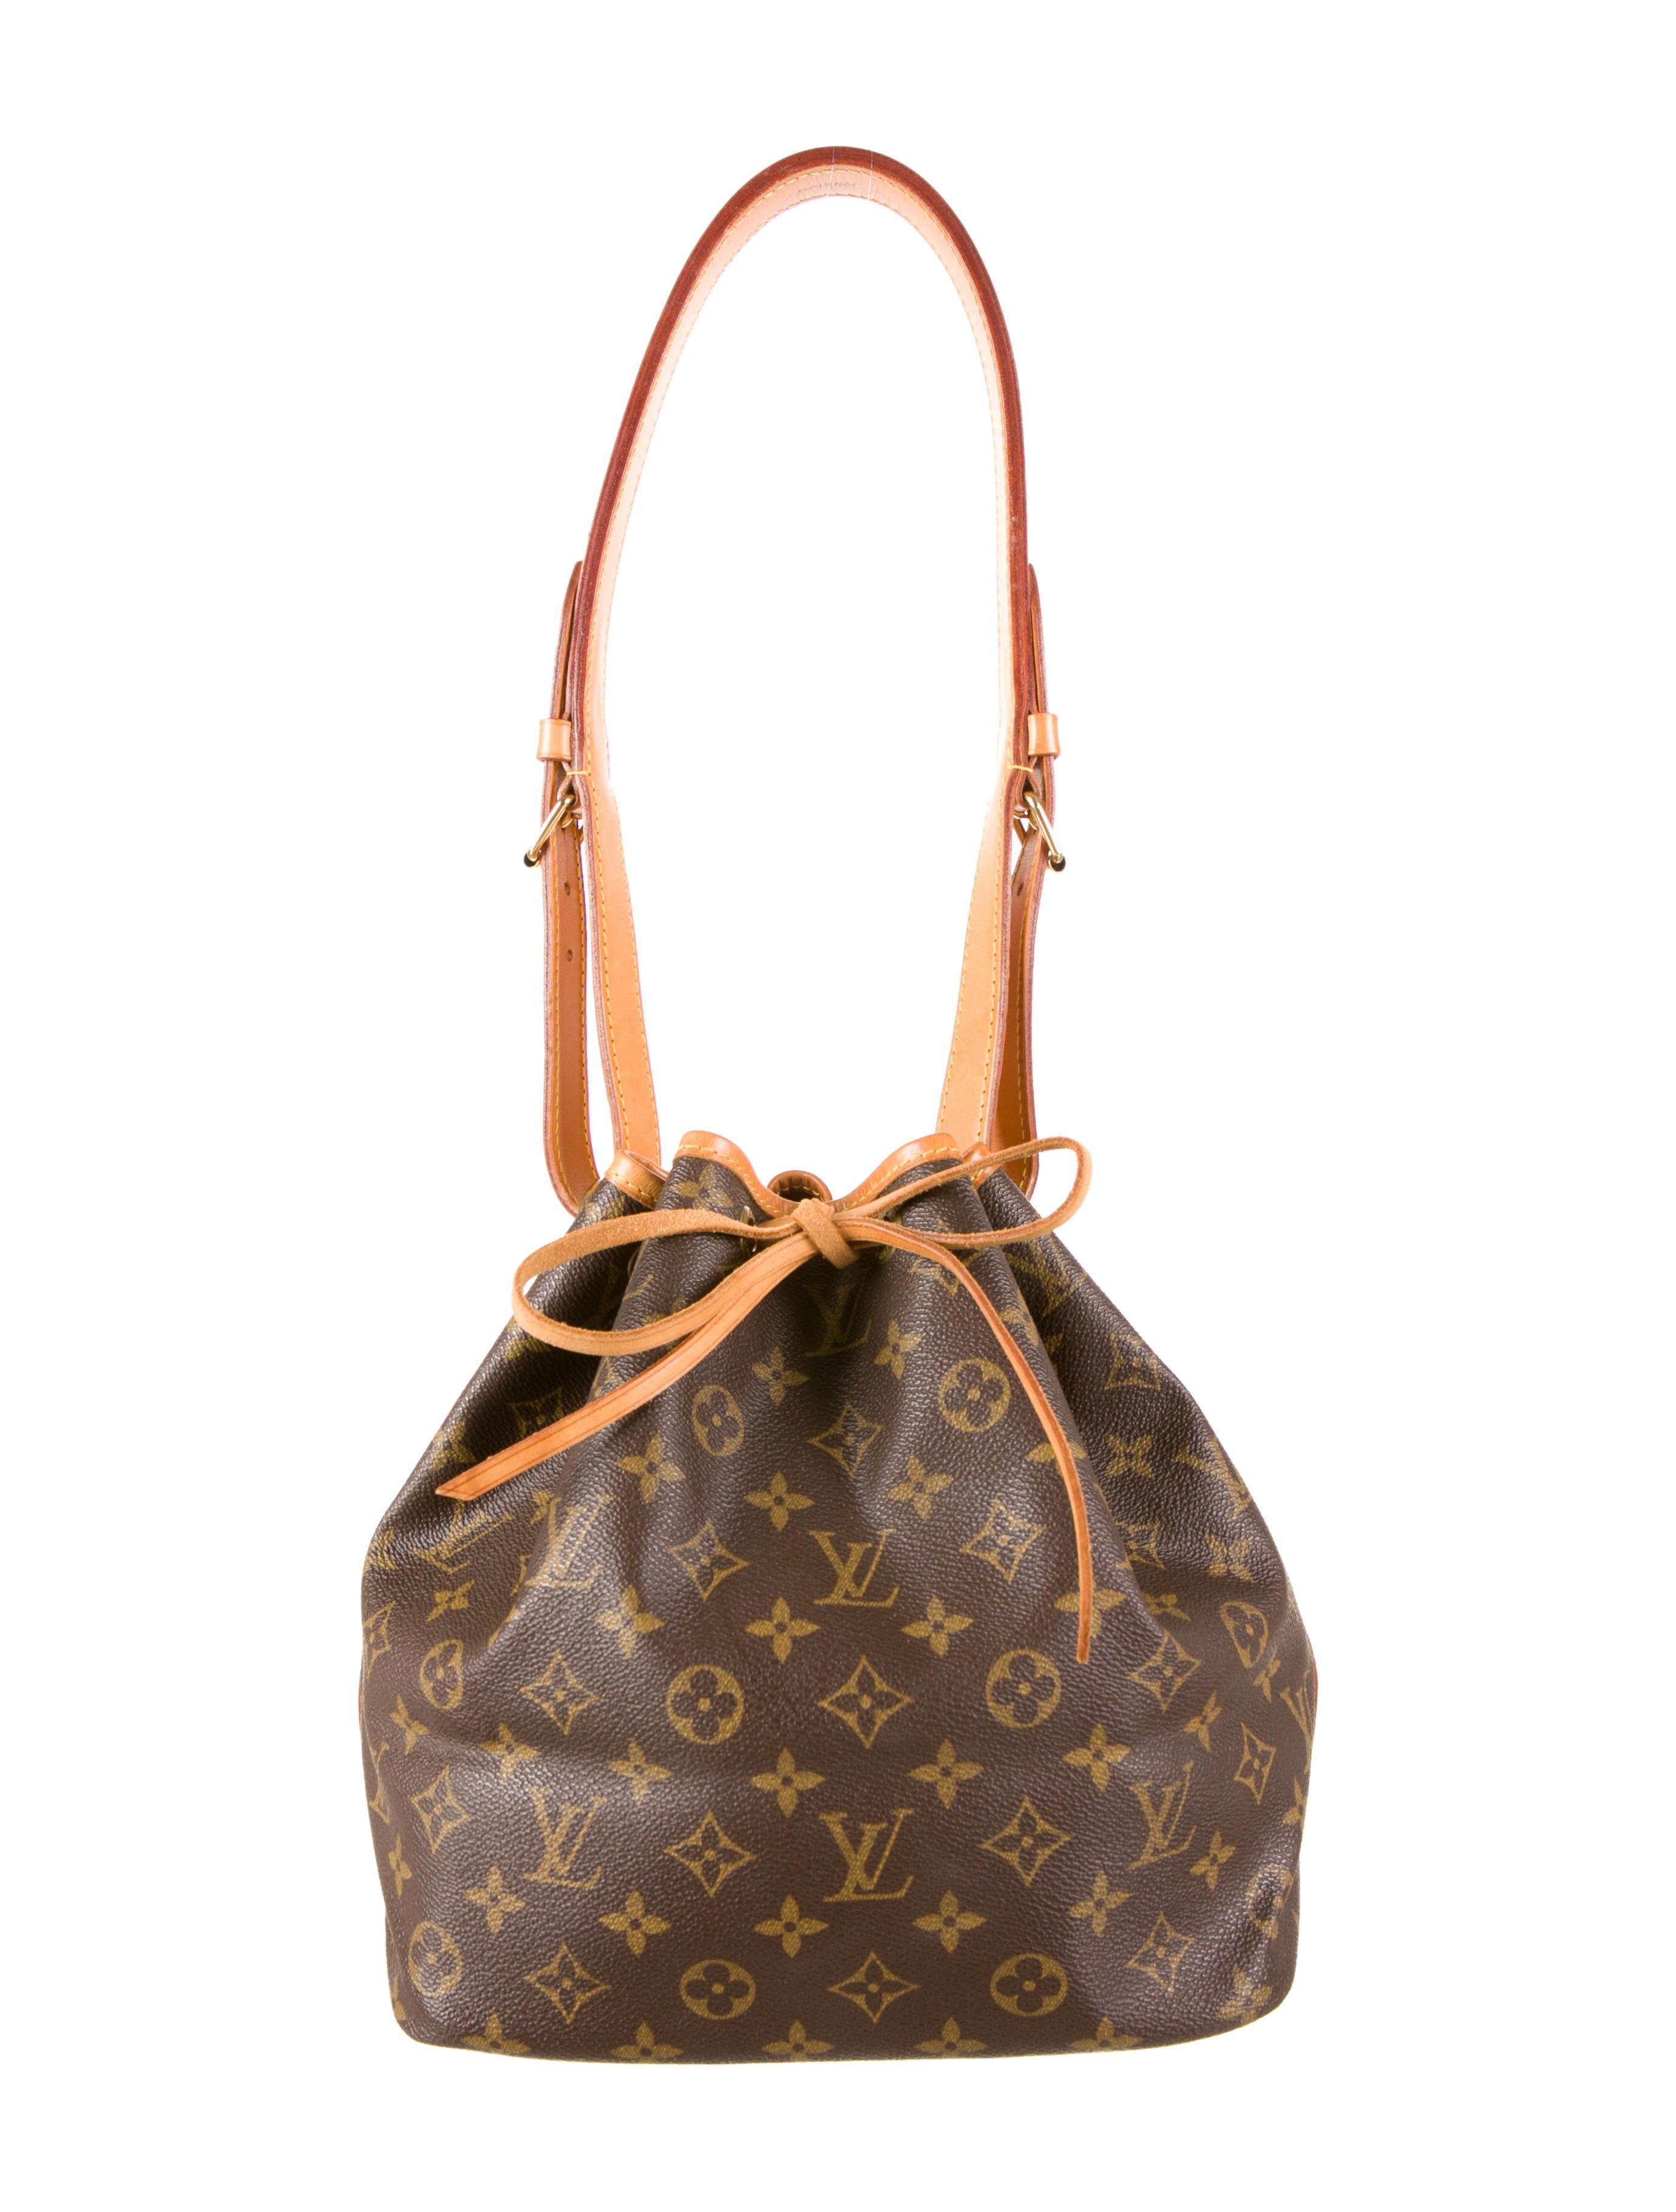 louis vuitton noe bag handbags lou46569 the realreal. Black Bedroom Furniture Sets. Home Design Ideas